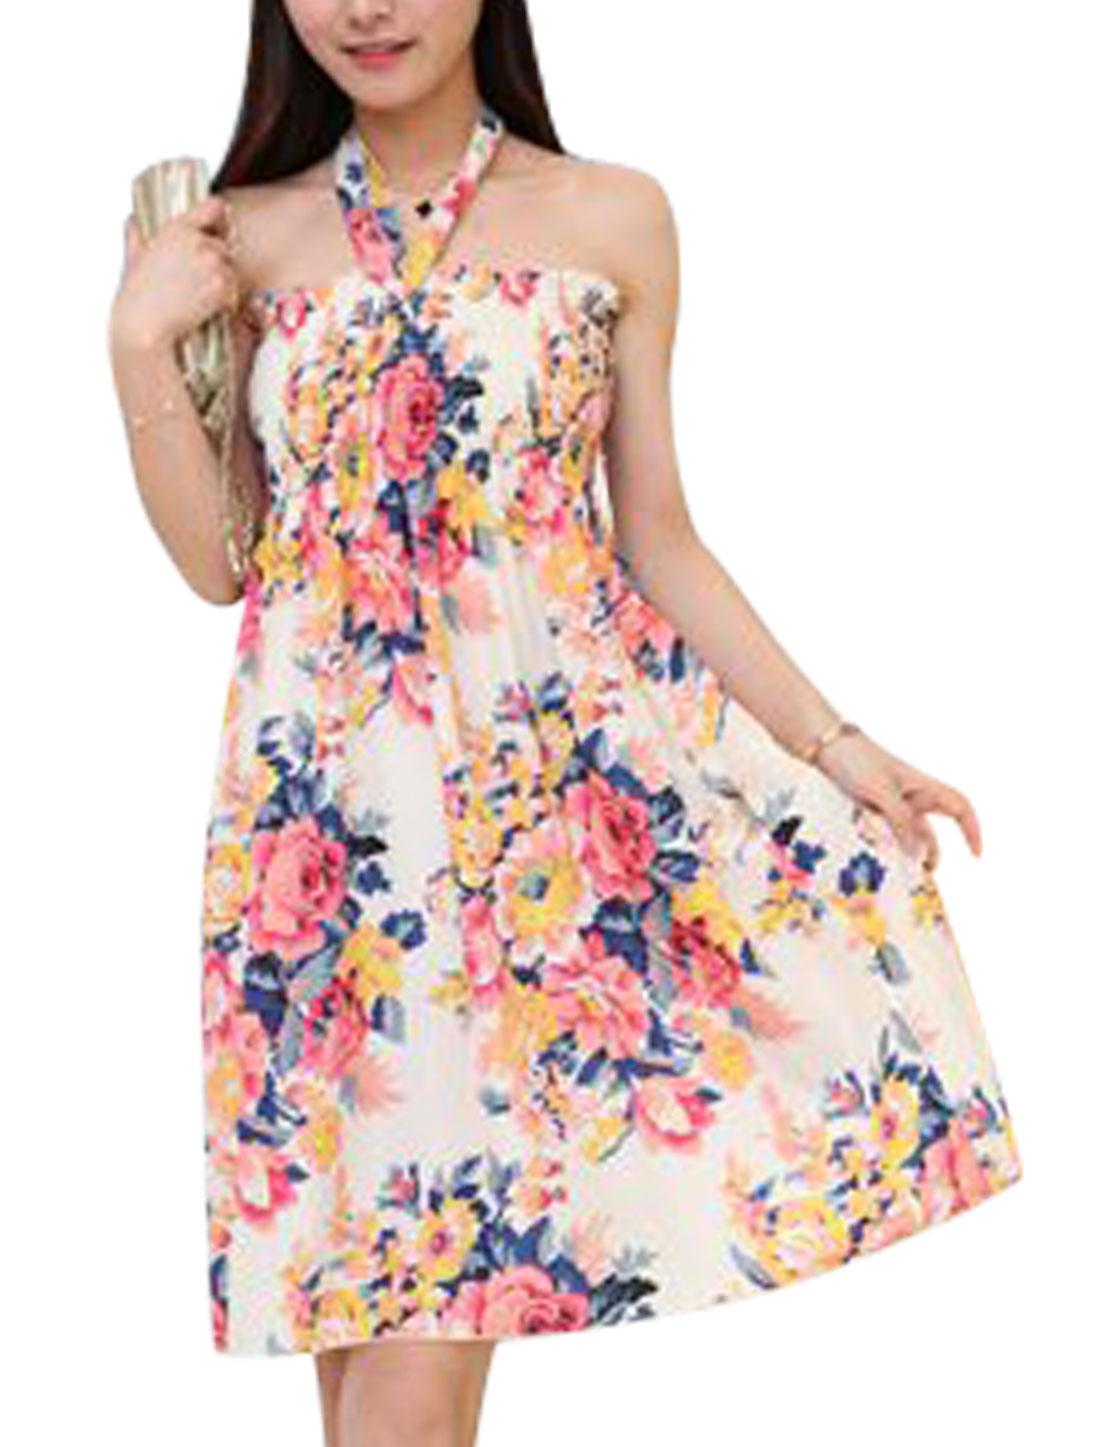 Ladies Halter Neck Flower Prints Sleeveless A Line Dress Beige S